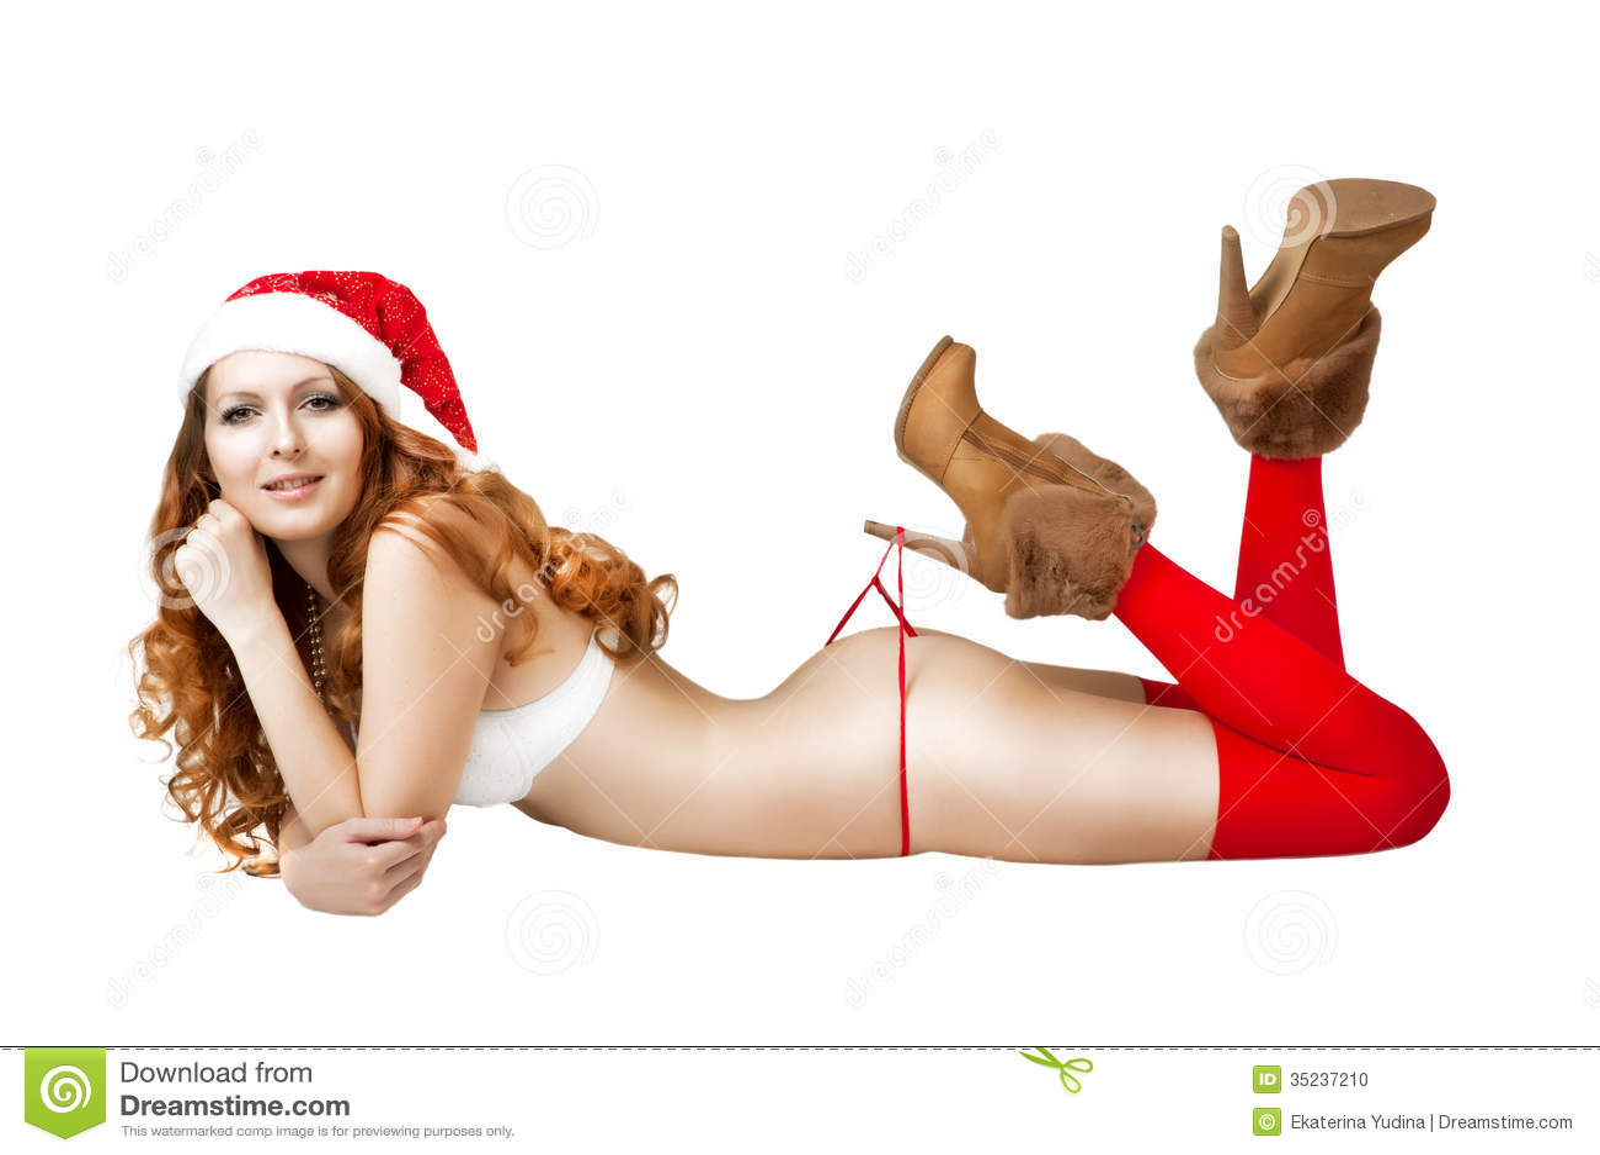 download image christmas santa girls dress pc android